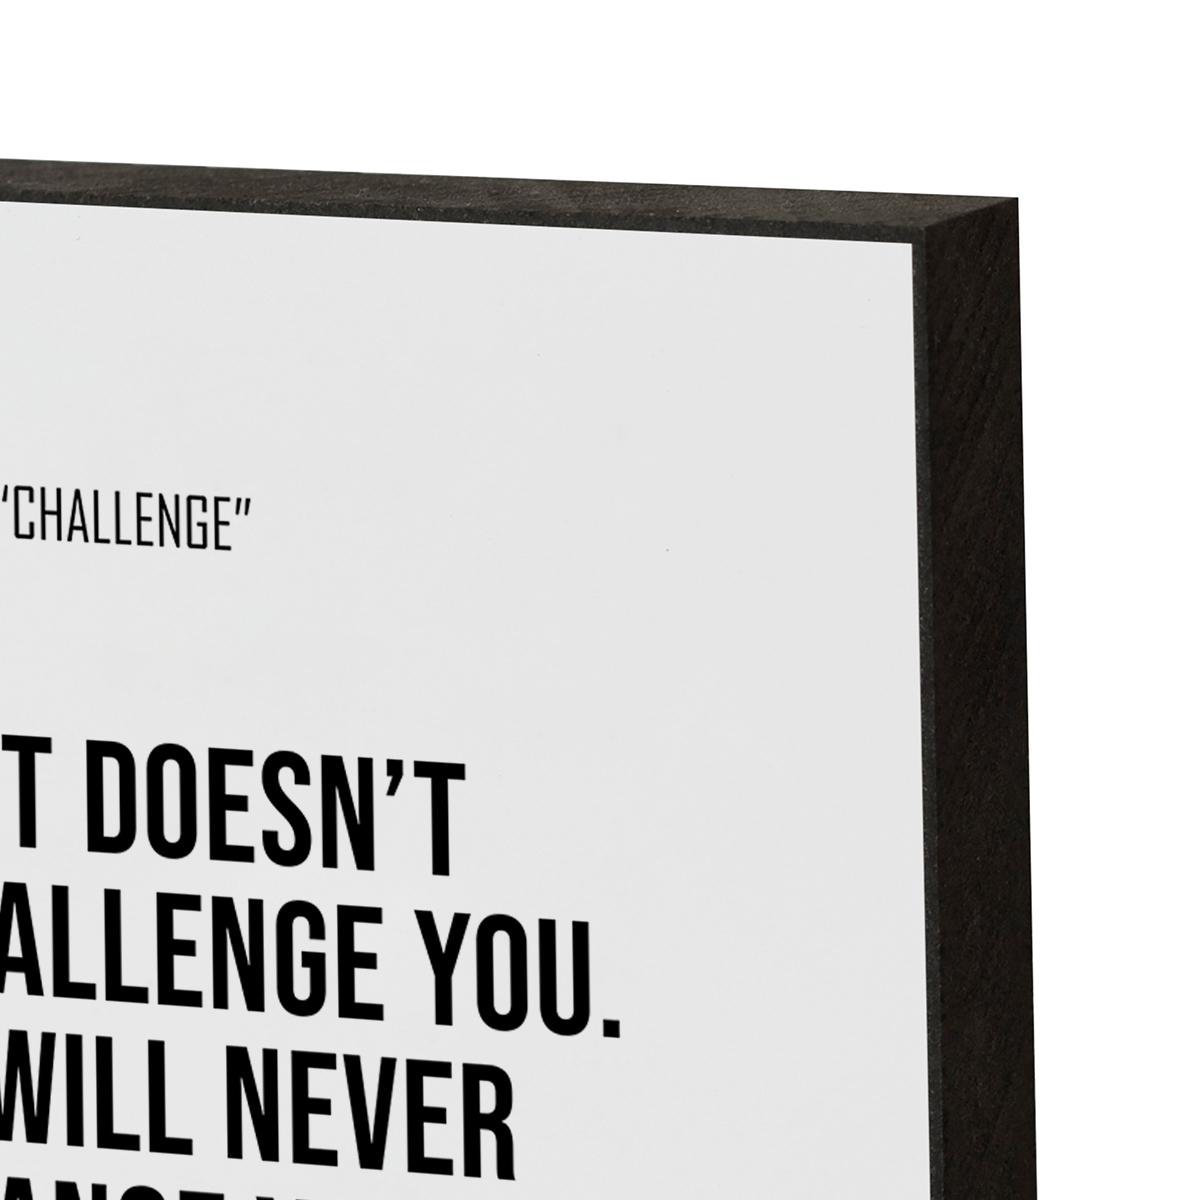 Art_Brick_træning_motion_udfordring_forandring